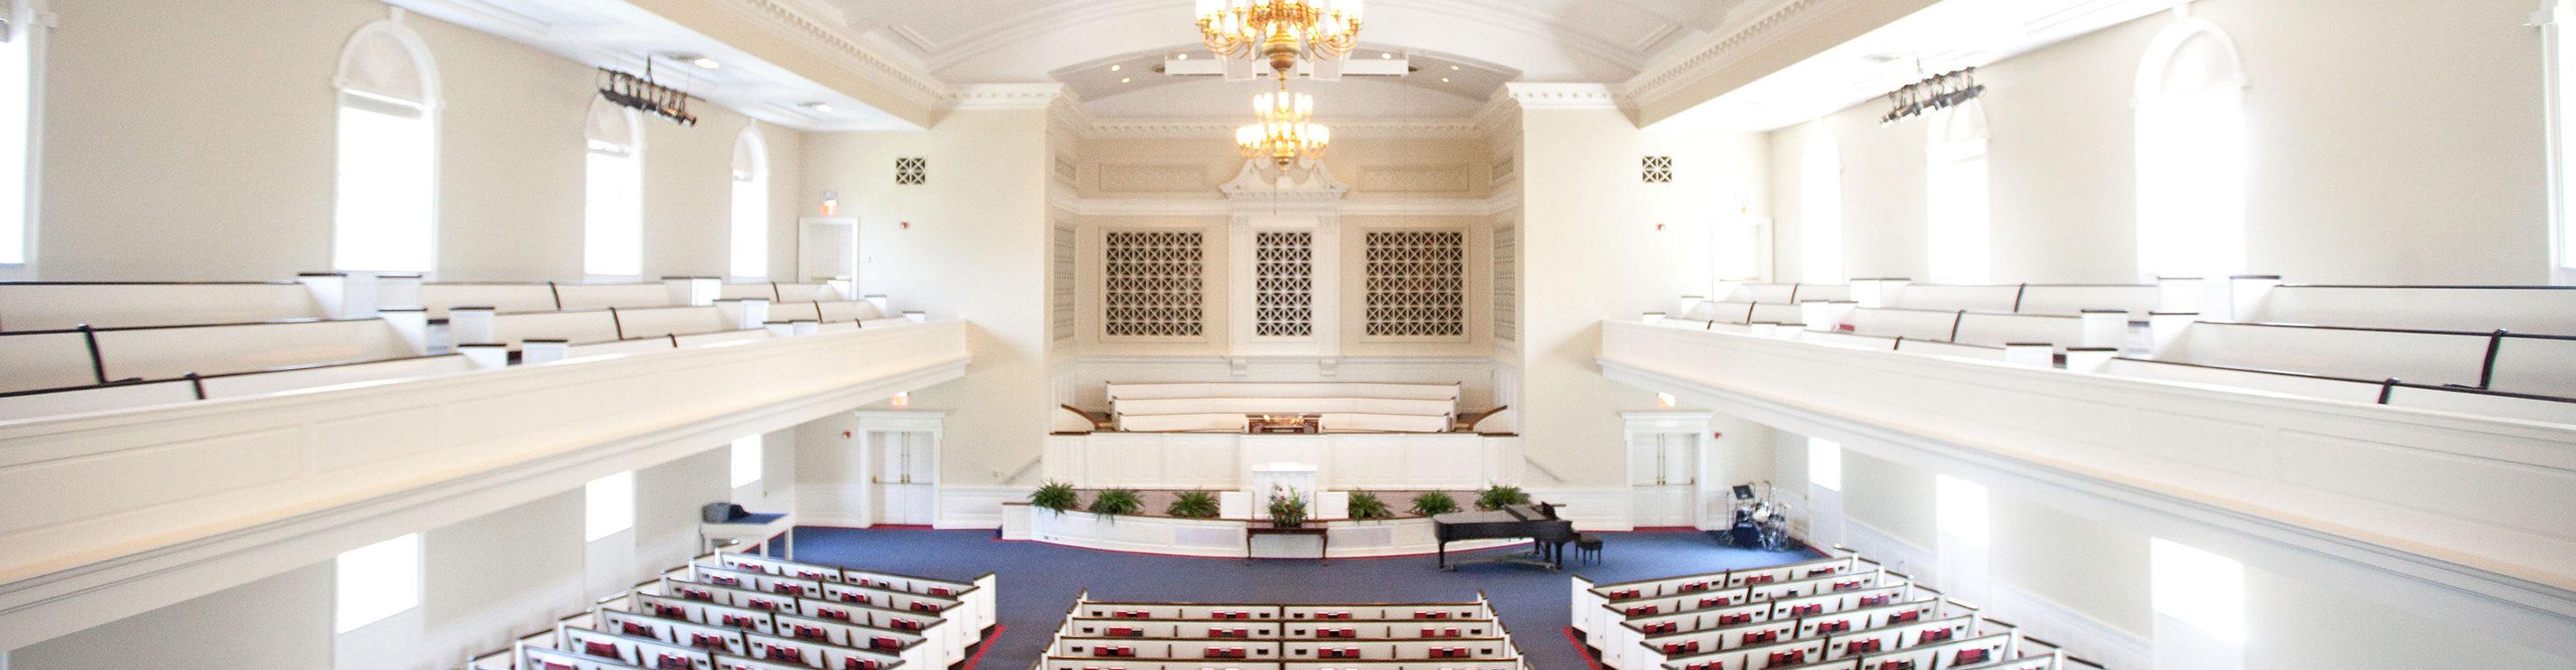 Alumni Memorial Chapel